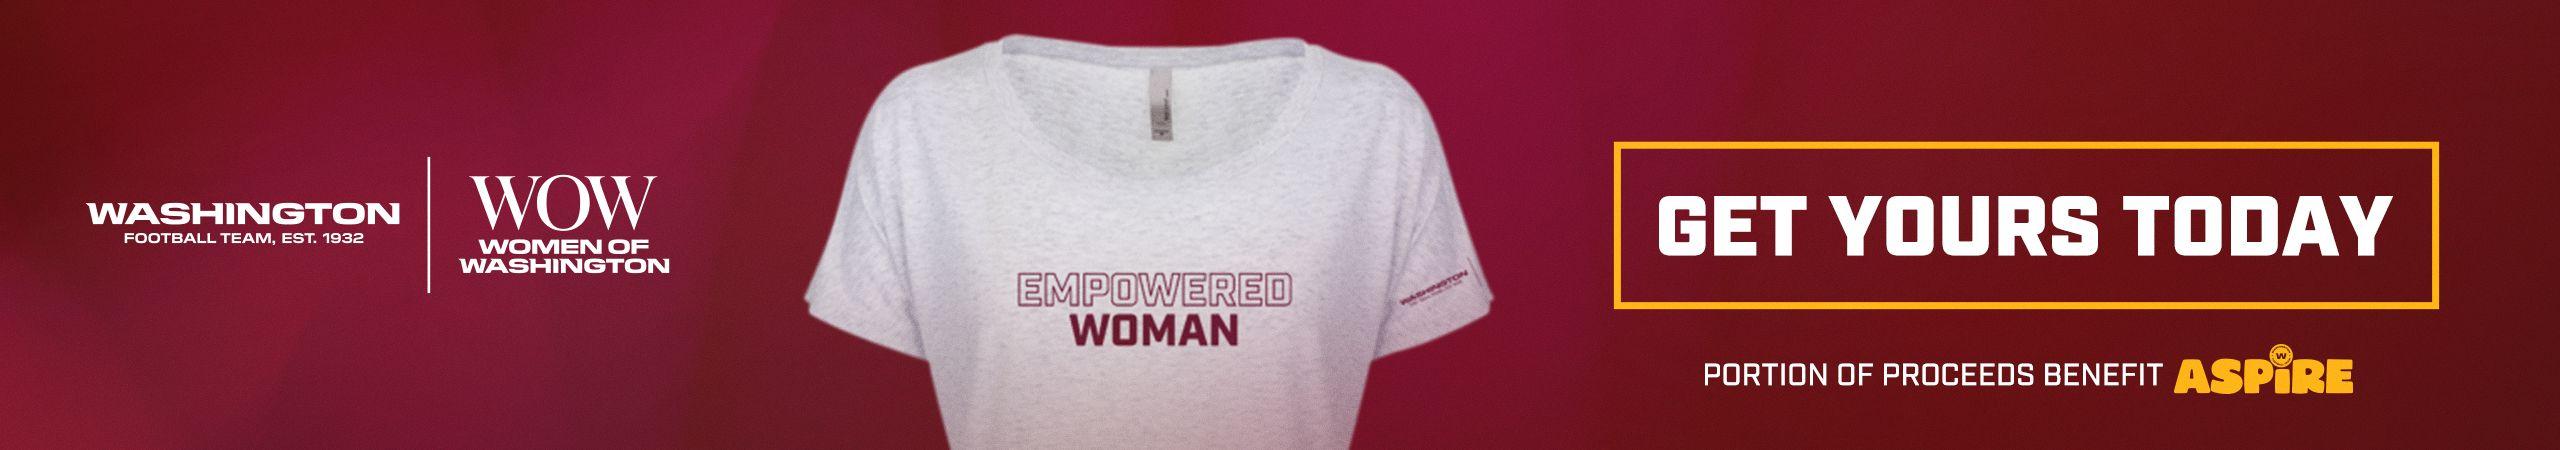 WomensHistoryMonth_WHMHub_ShirtPromoBanner(v2)_ 2560x450